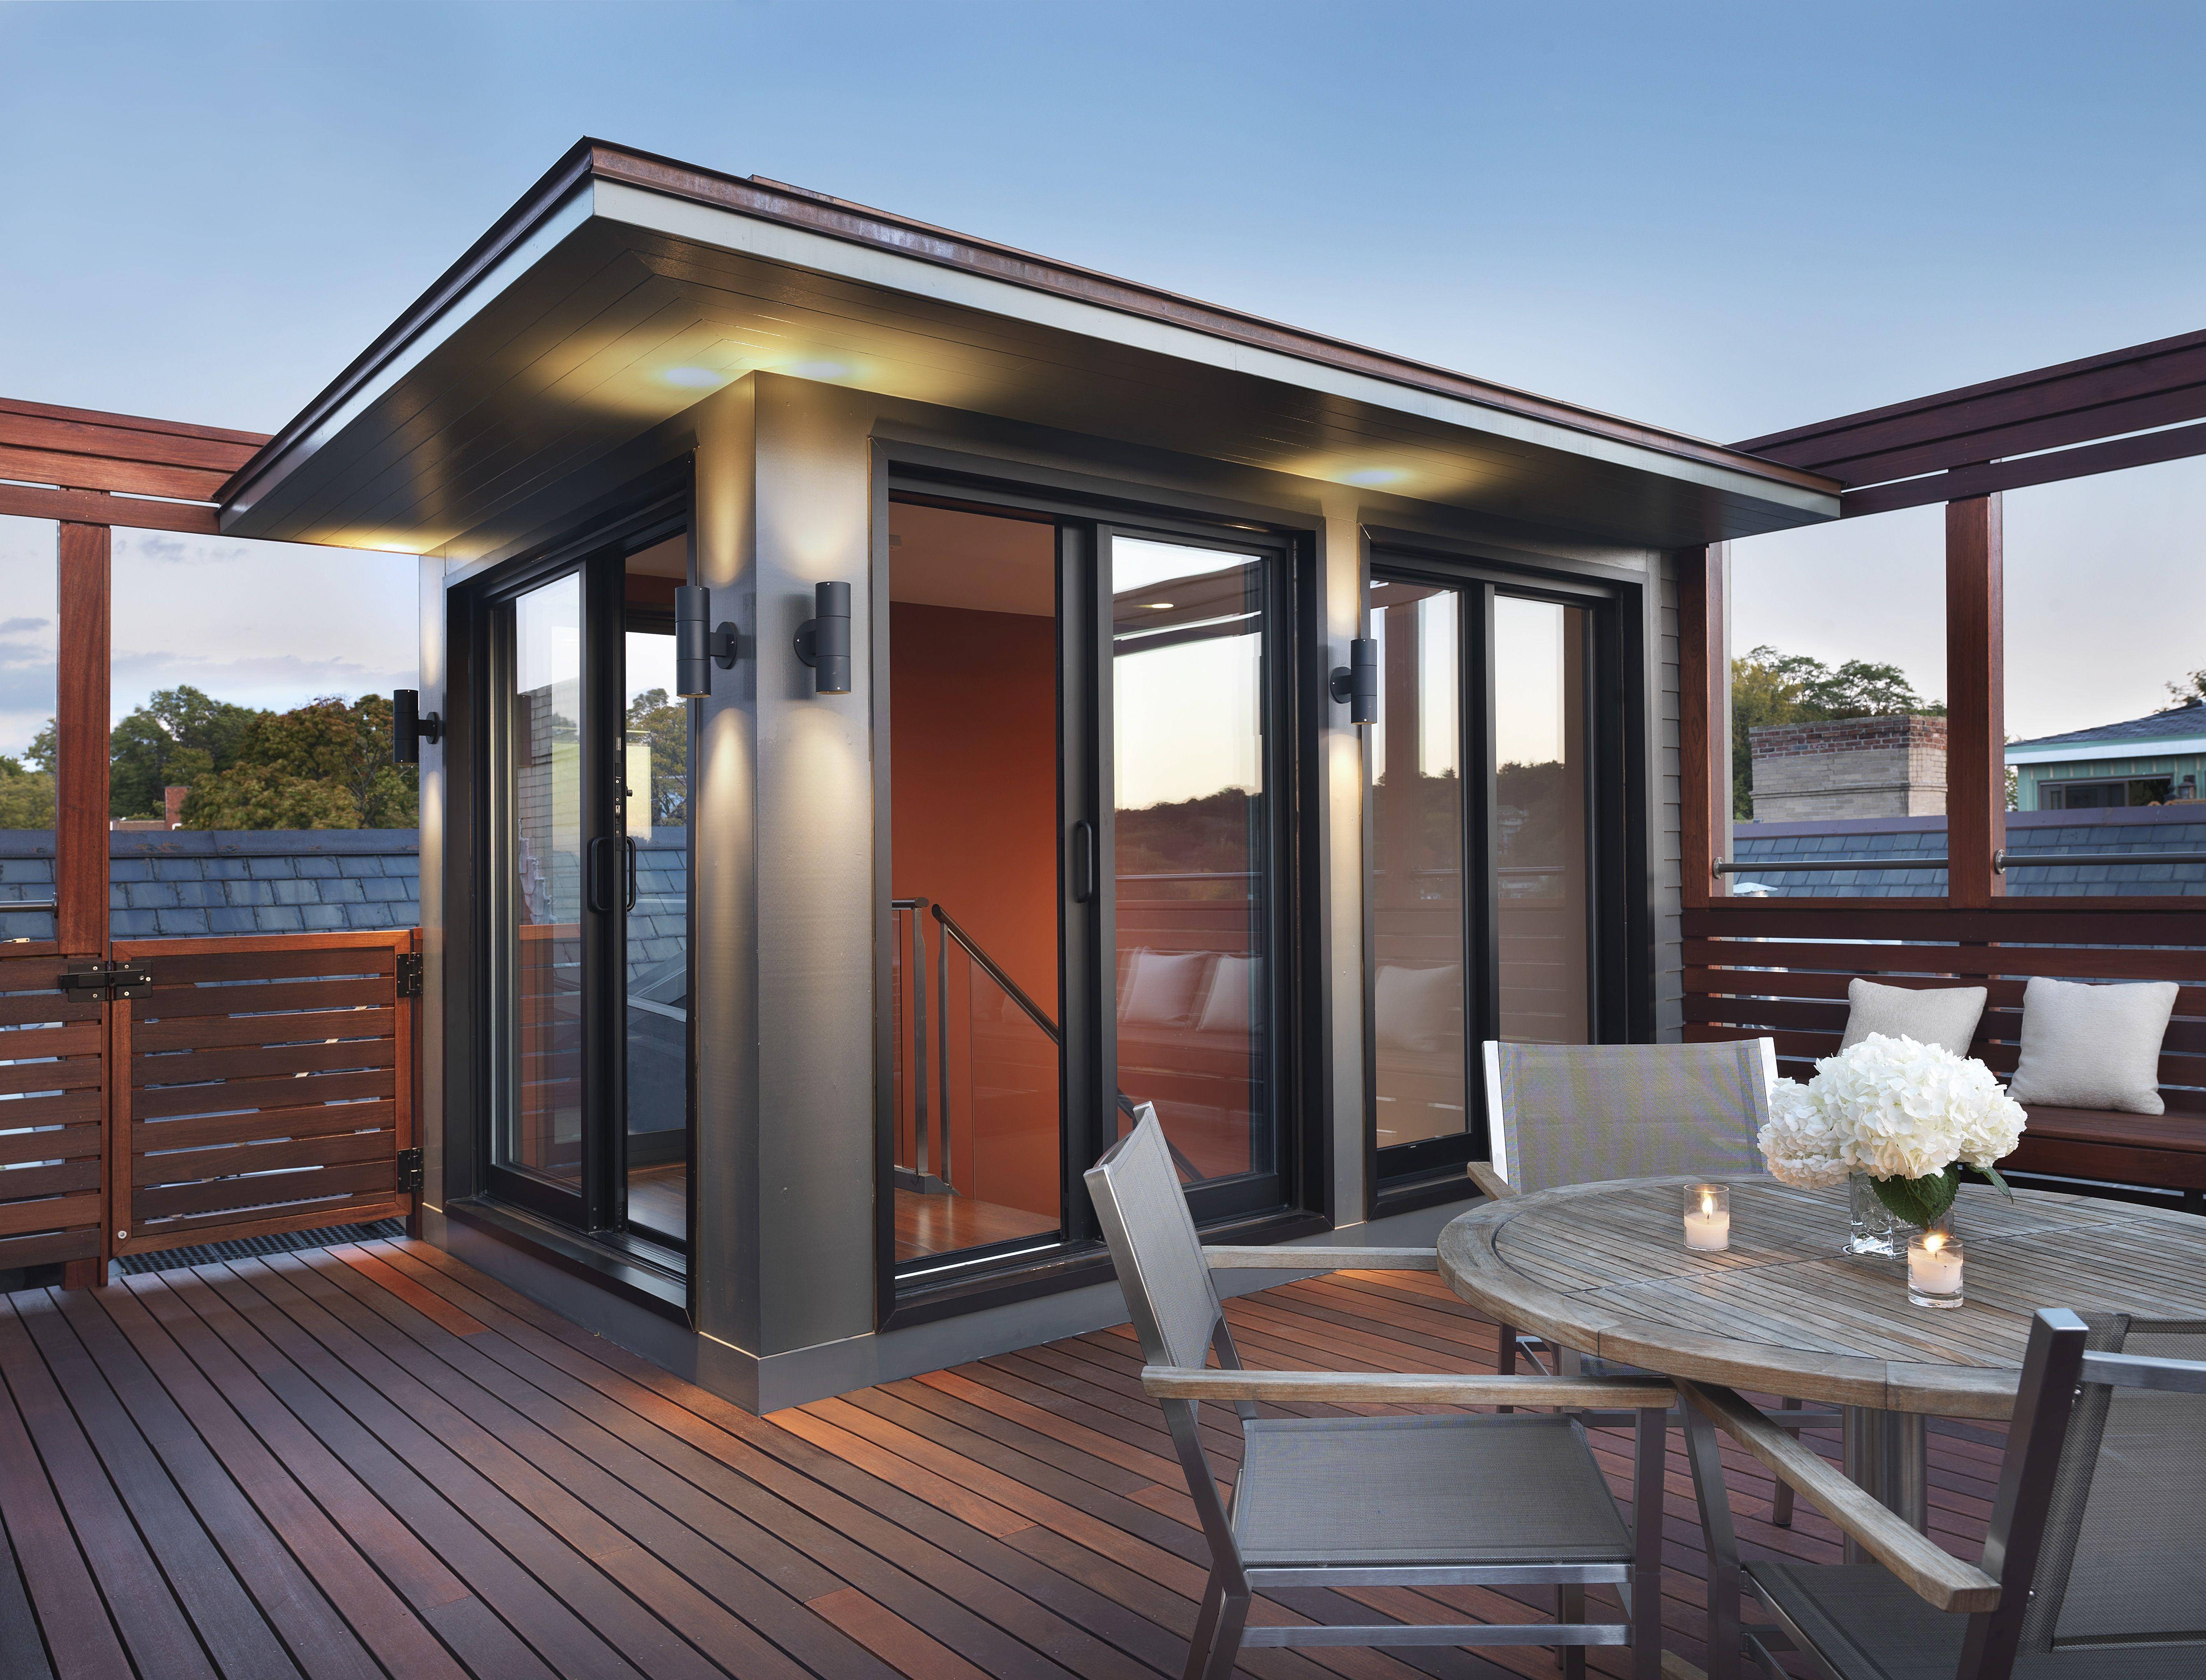 A Brookline Roof Deck Gets A Second Life Rooftop Deck